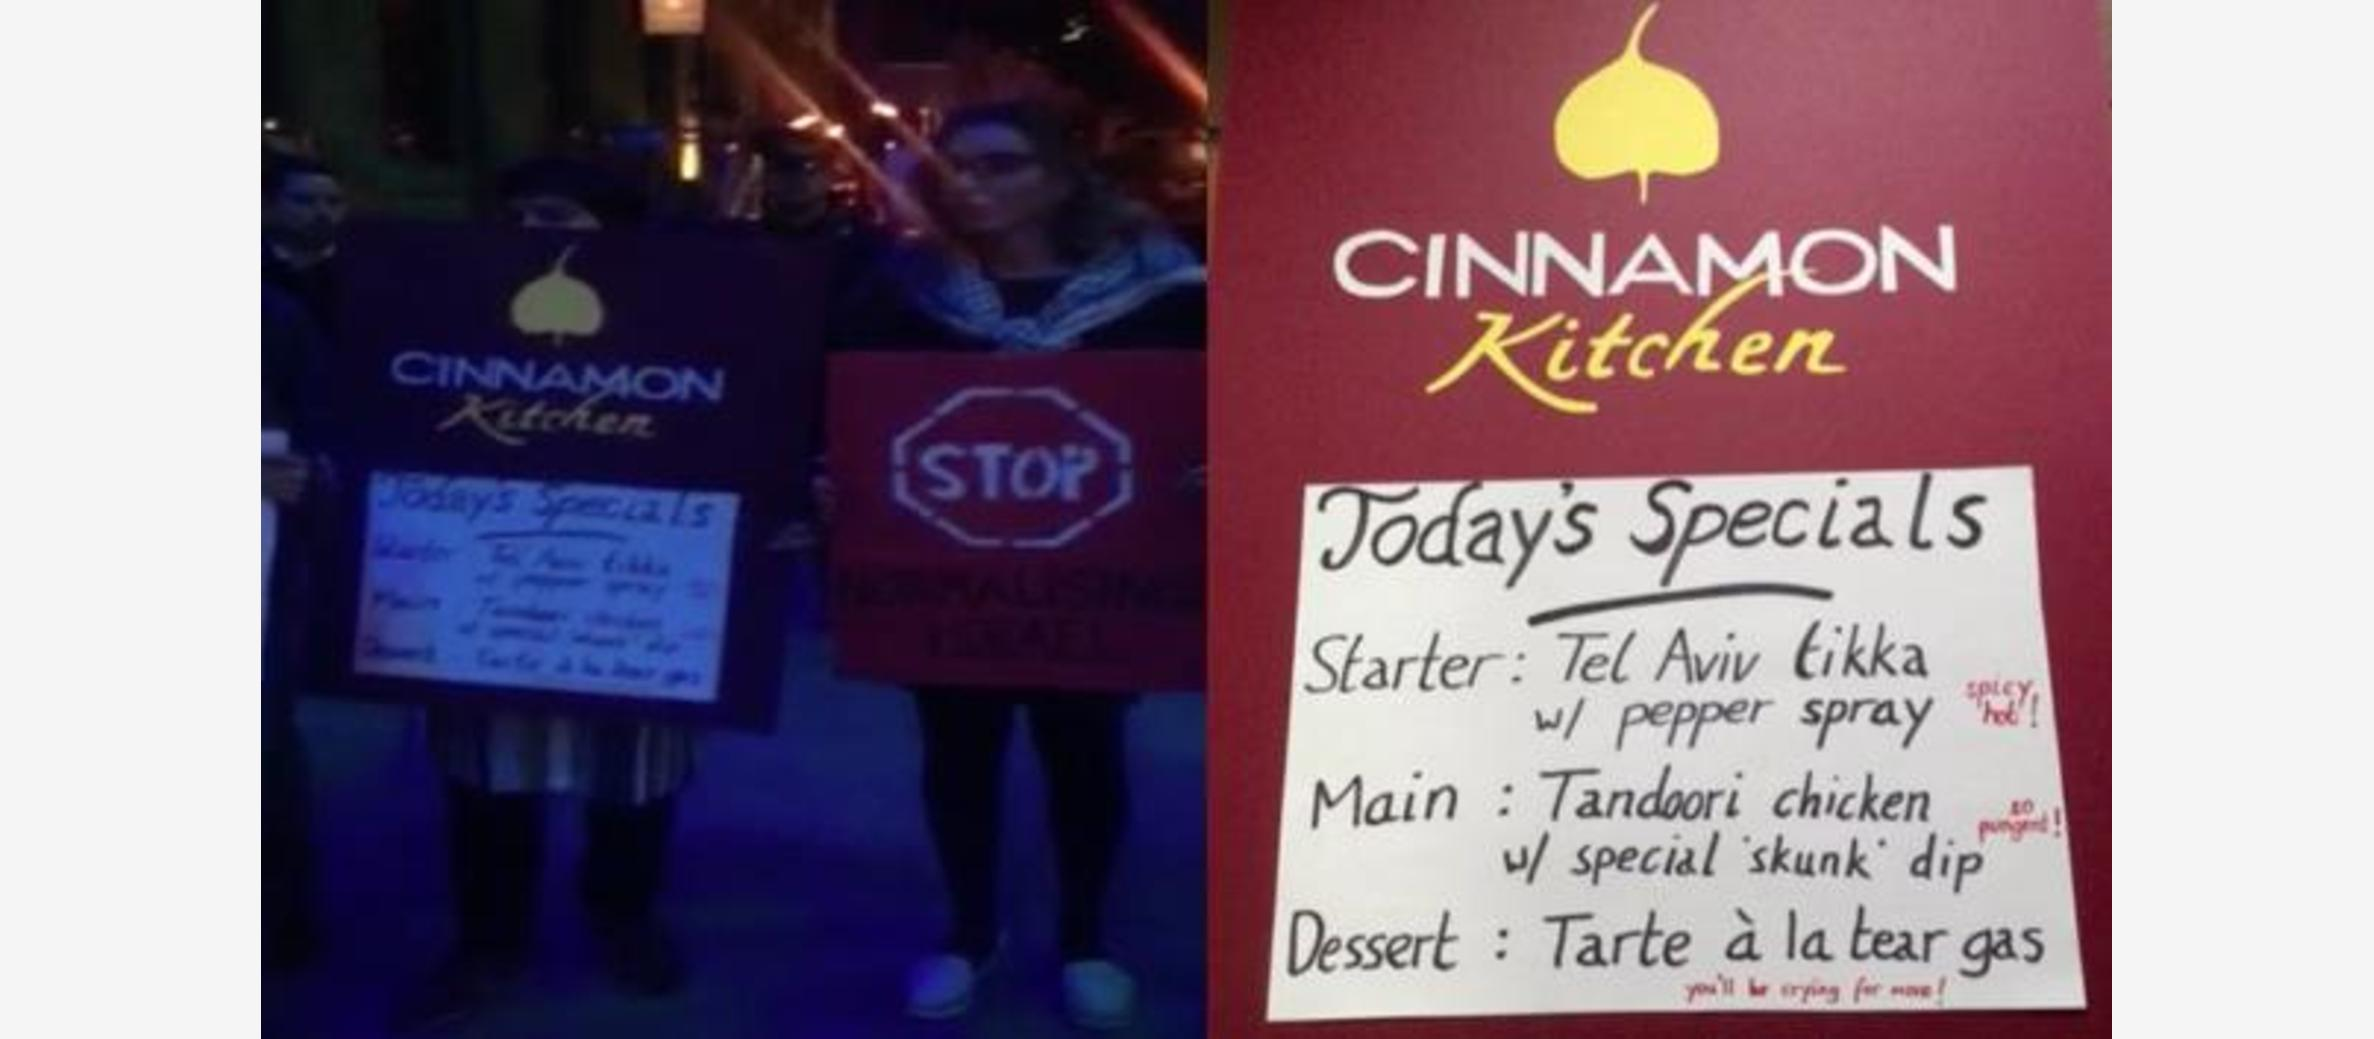 BDS activists target London Indian restaurant